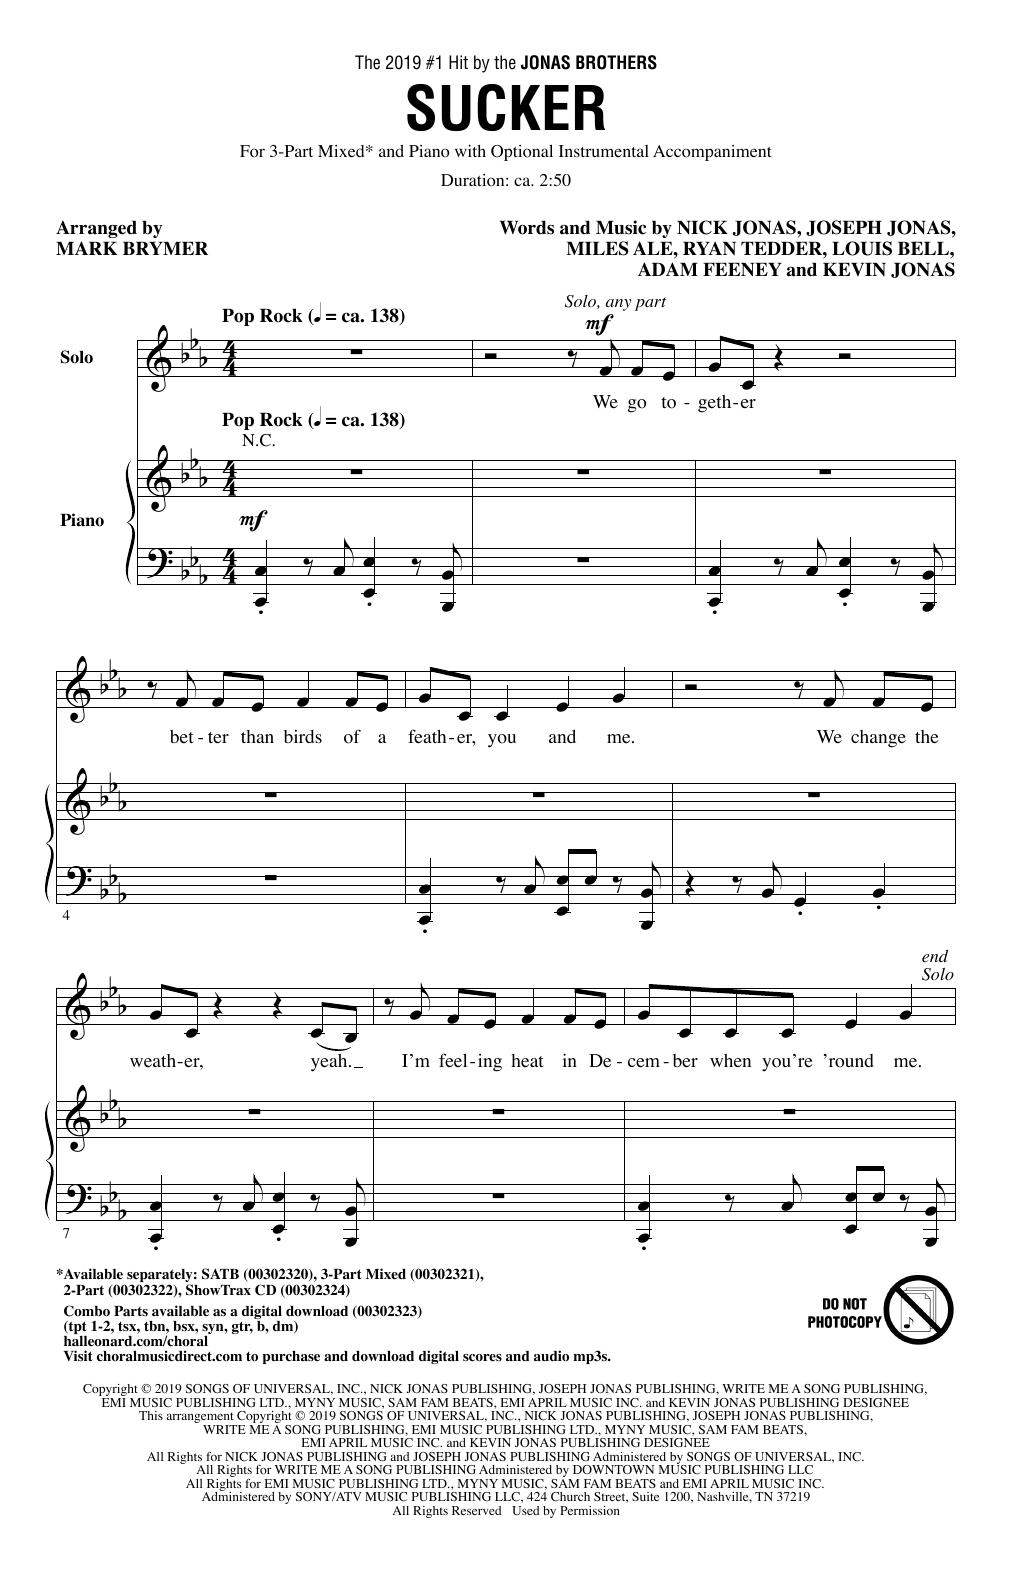 Partition chorale Sucker (arr. Mark Brymer) de Jonas Brothers - 3 voix mixtes